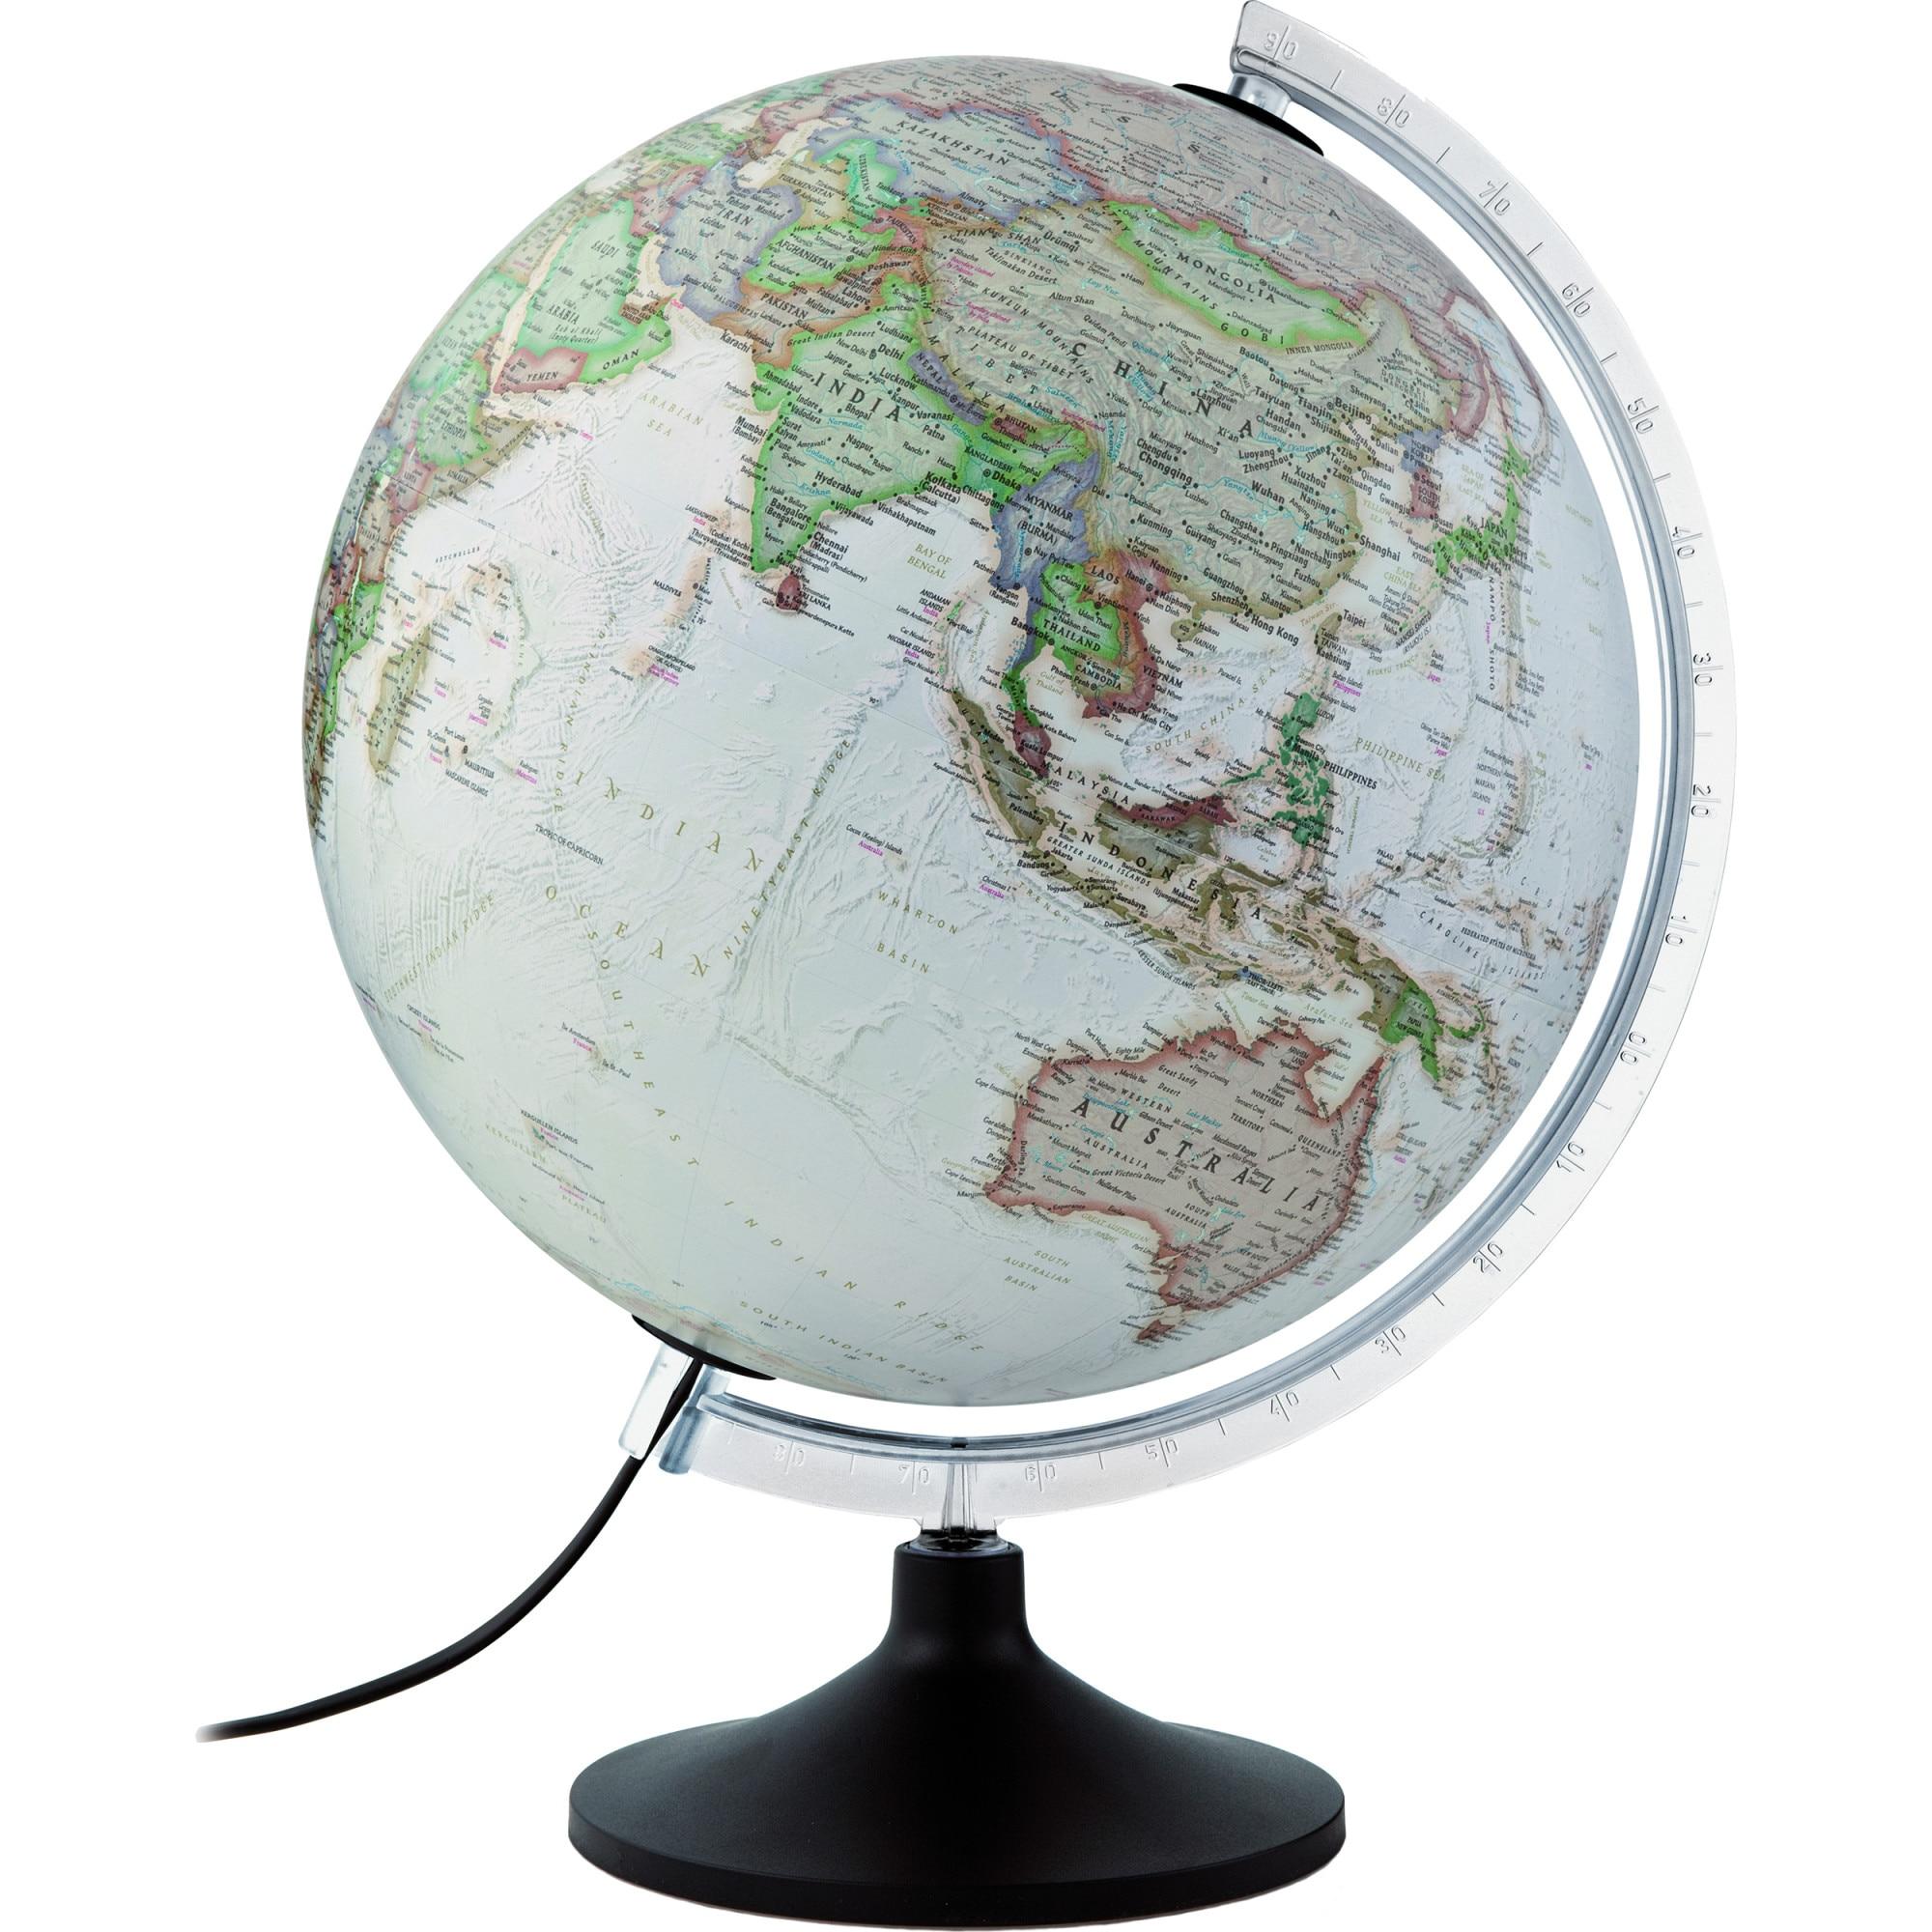 Fotografie Glob iluminat Tecnodidattica CarbonExe, National Geographic 30 cm, piedestal lemn, meridian metalic